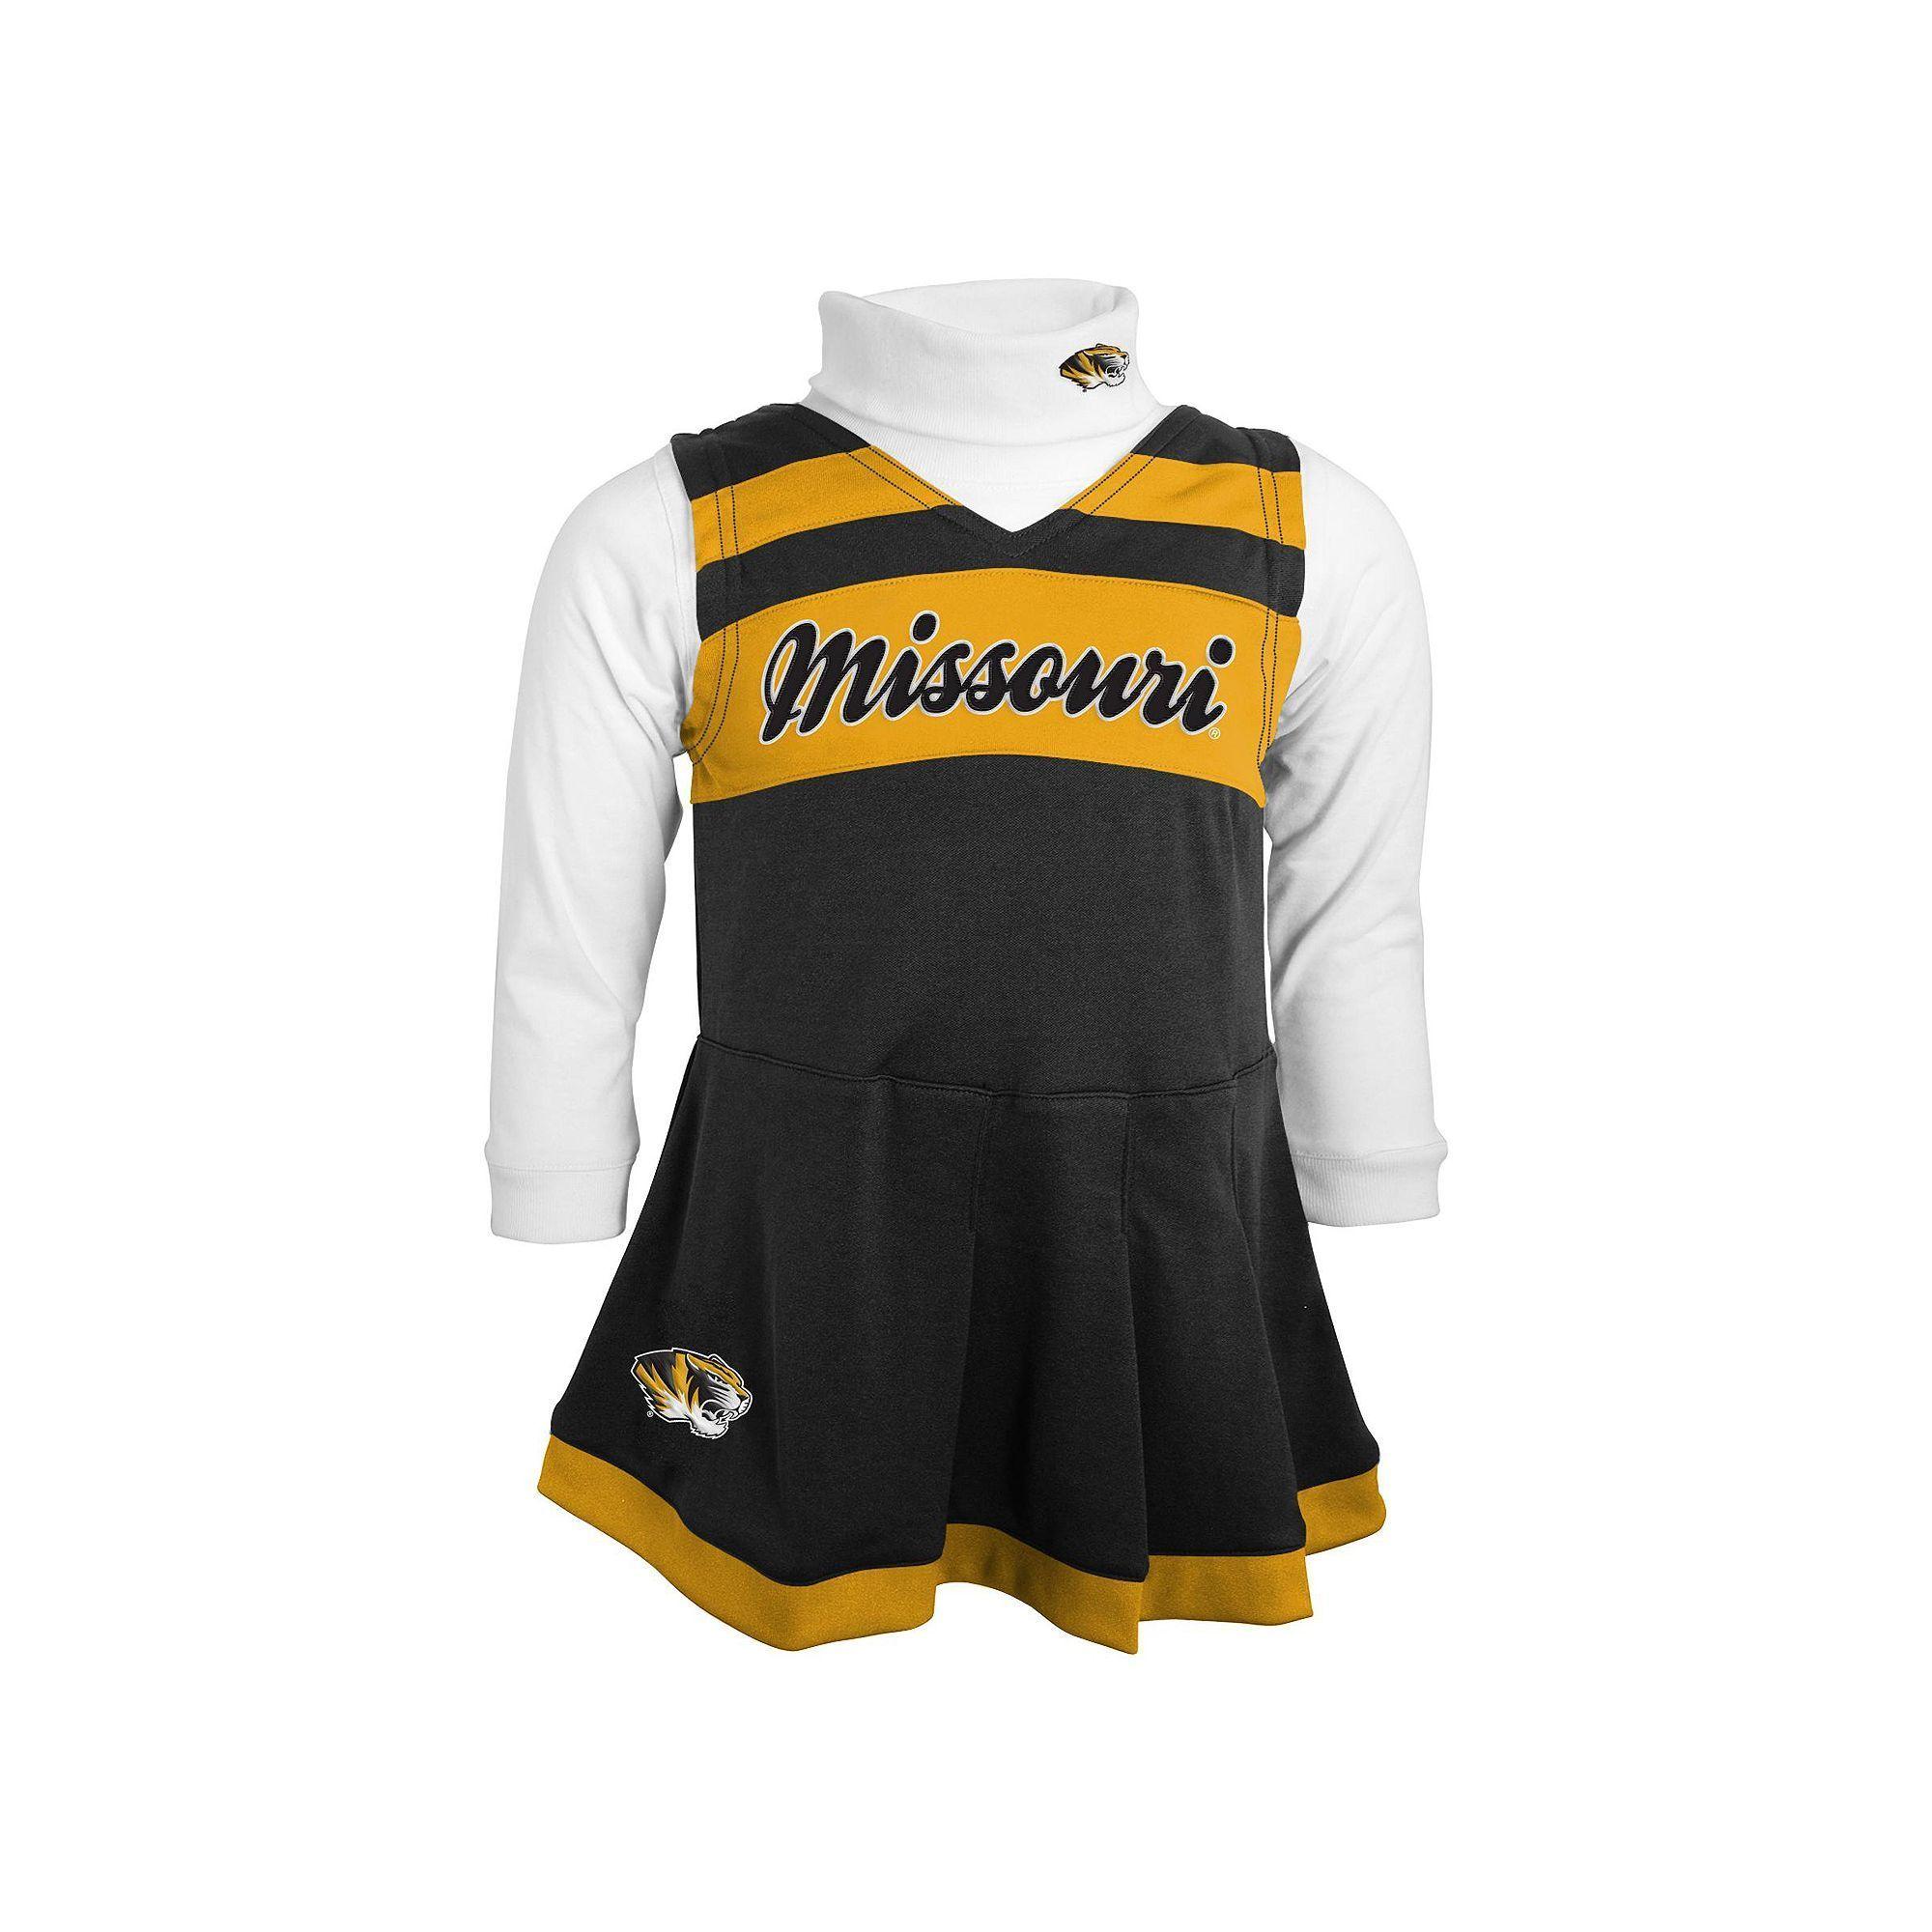 Toddler Missouri Tigers Cheerleader Jumper Set bec2ae87b